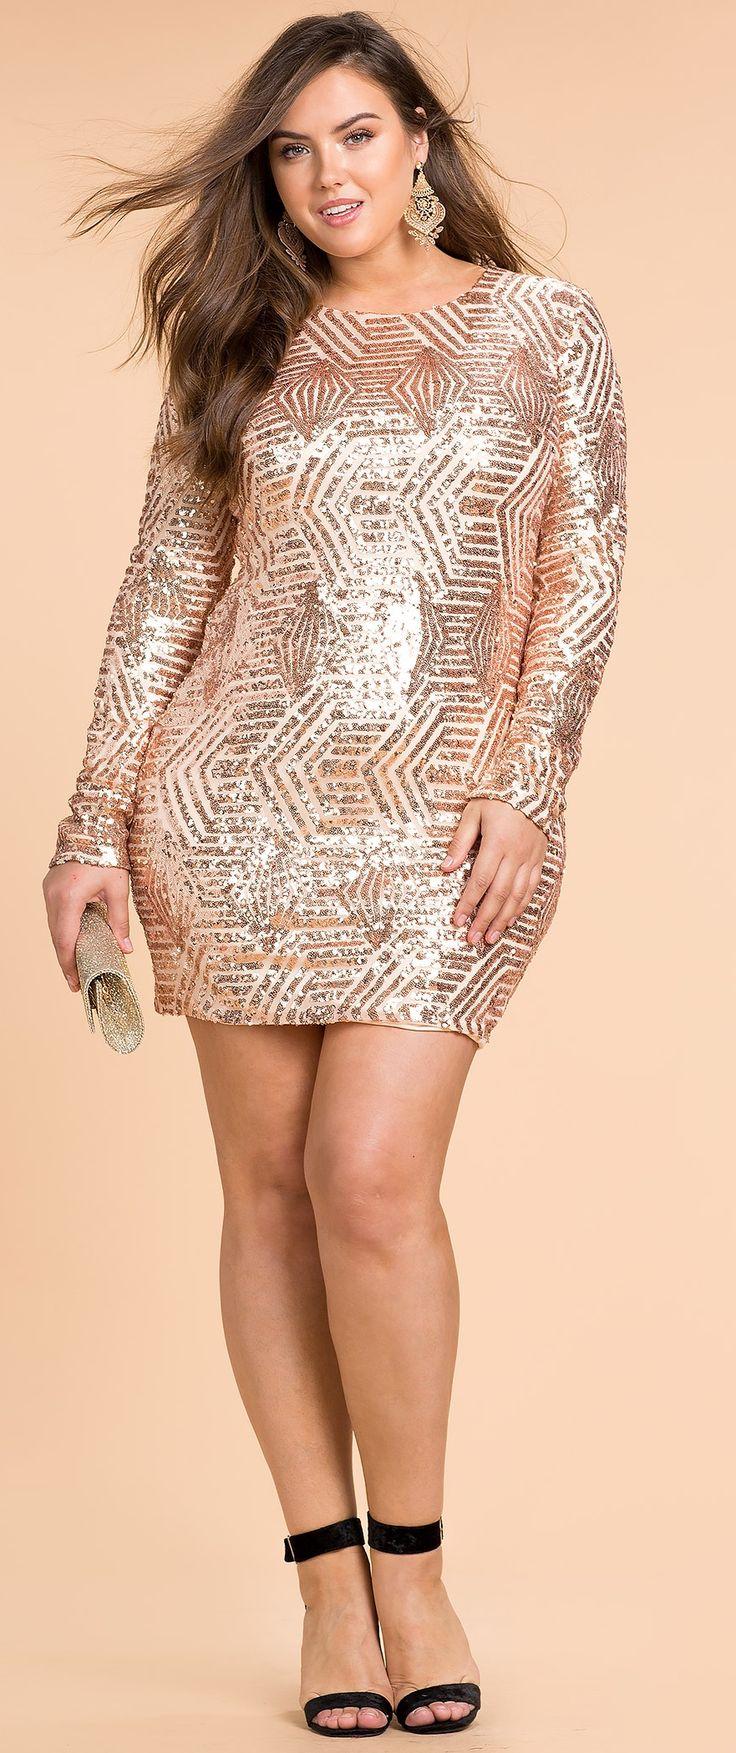 17 best ideas about 21st birthday dresses on pinterest